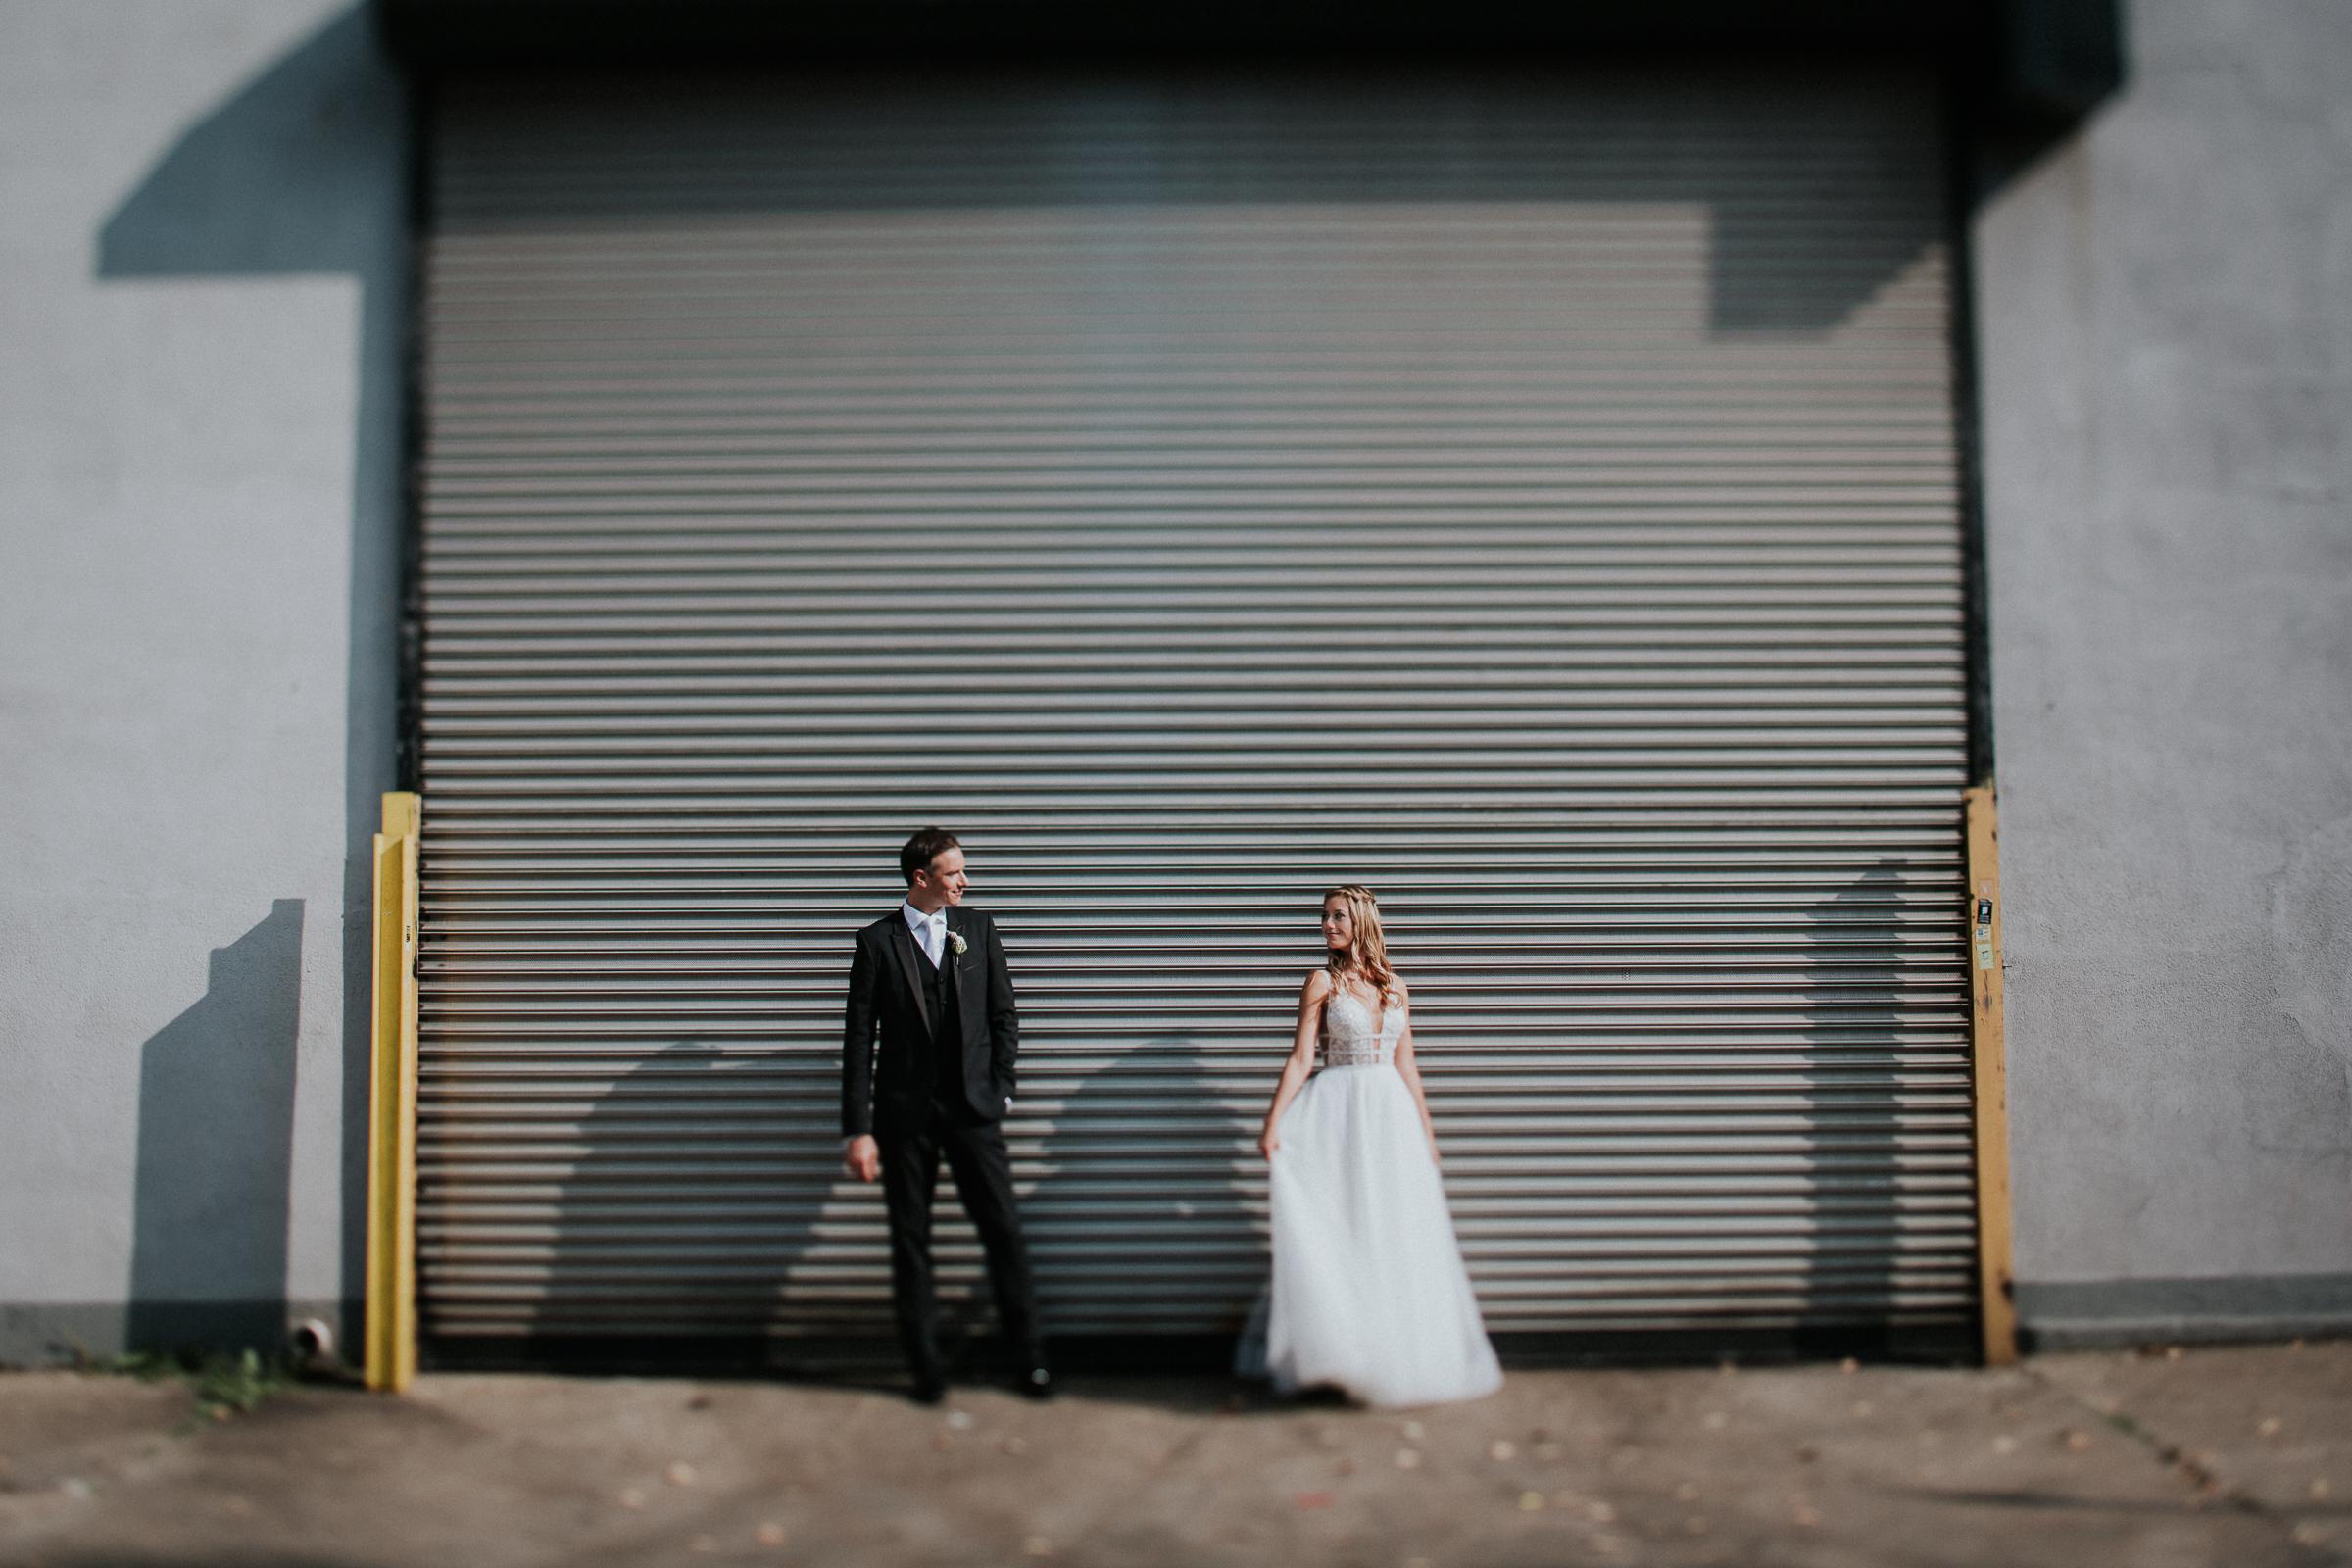 Ravel-Hotel-Penthouse-808-Long-Island-City-New-York-Documentary-Wedding-Photographer-38.jpg